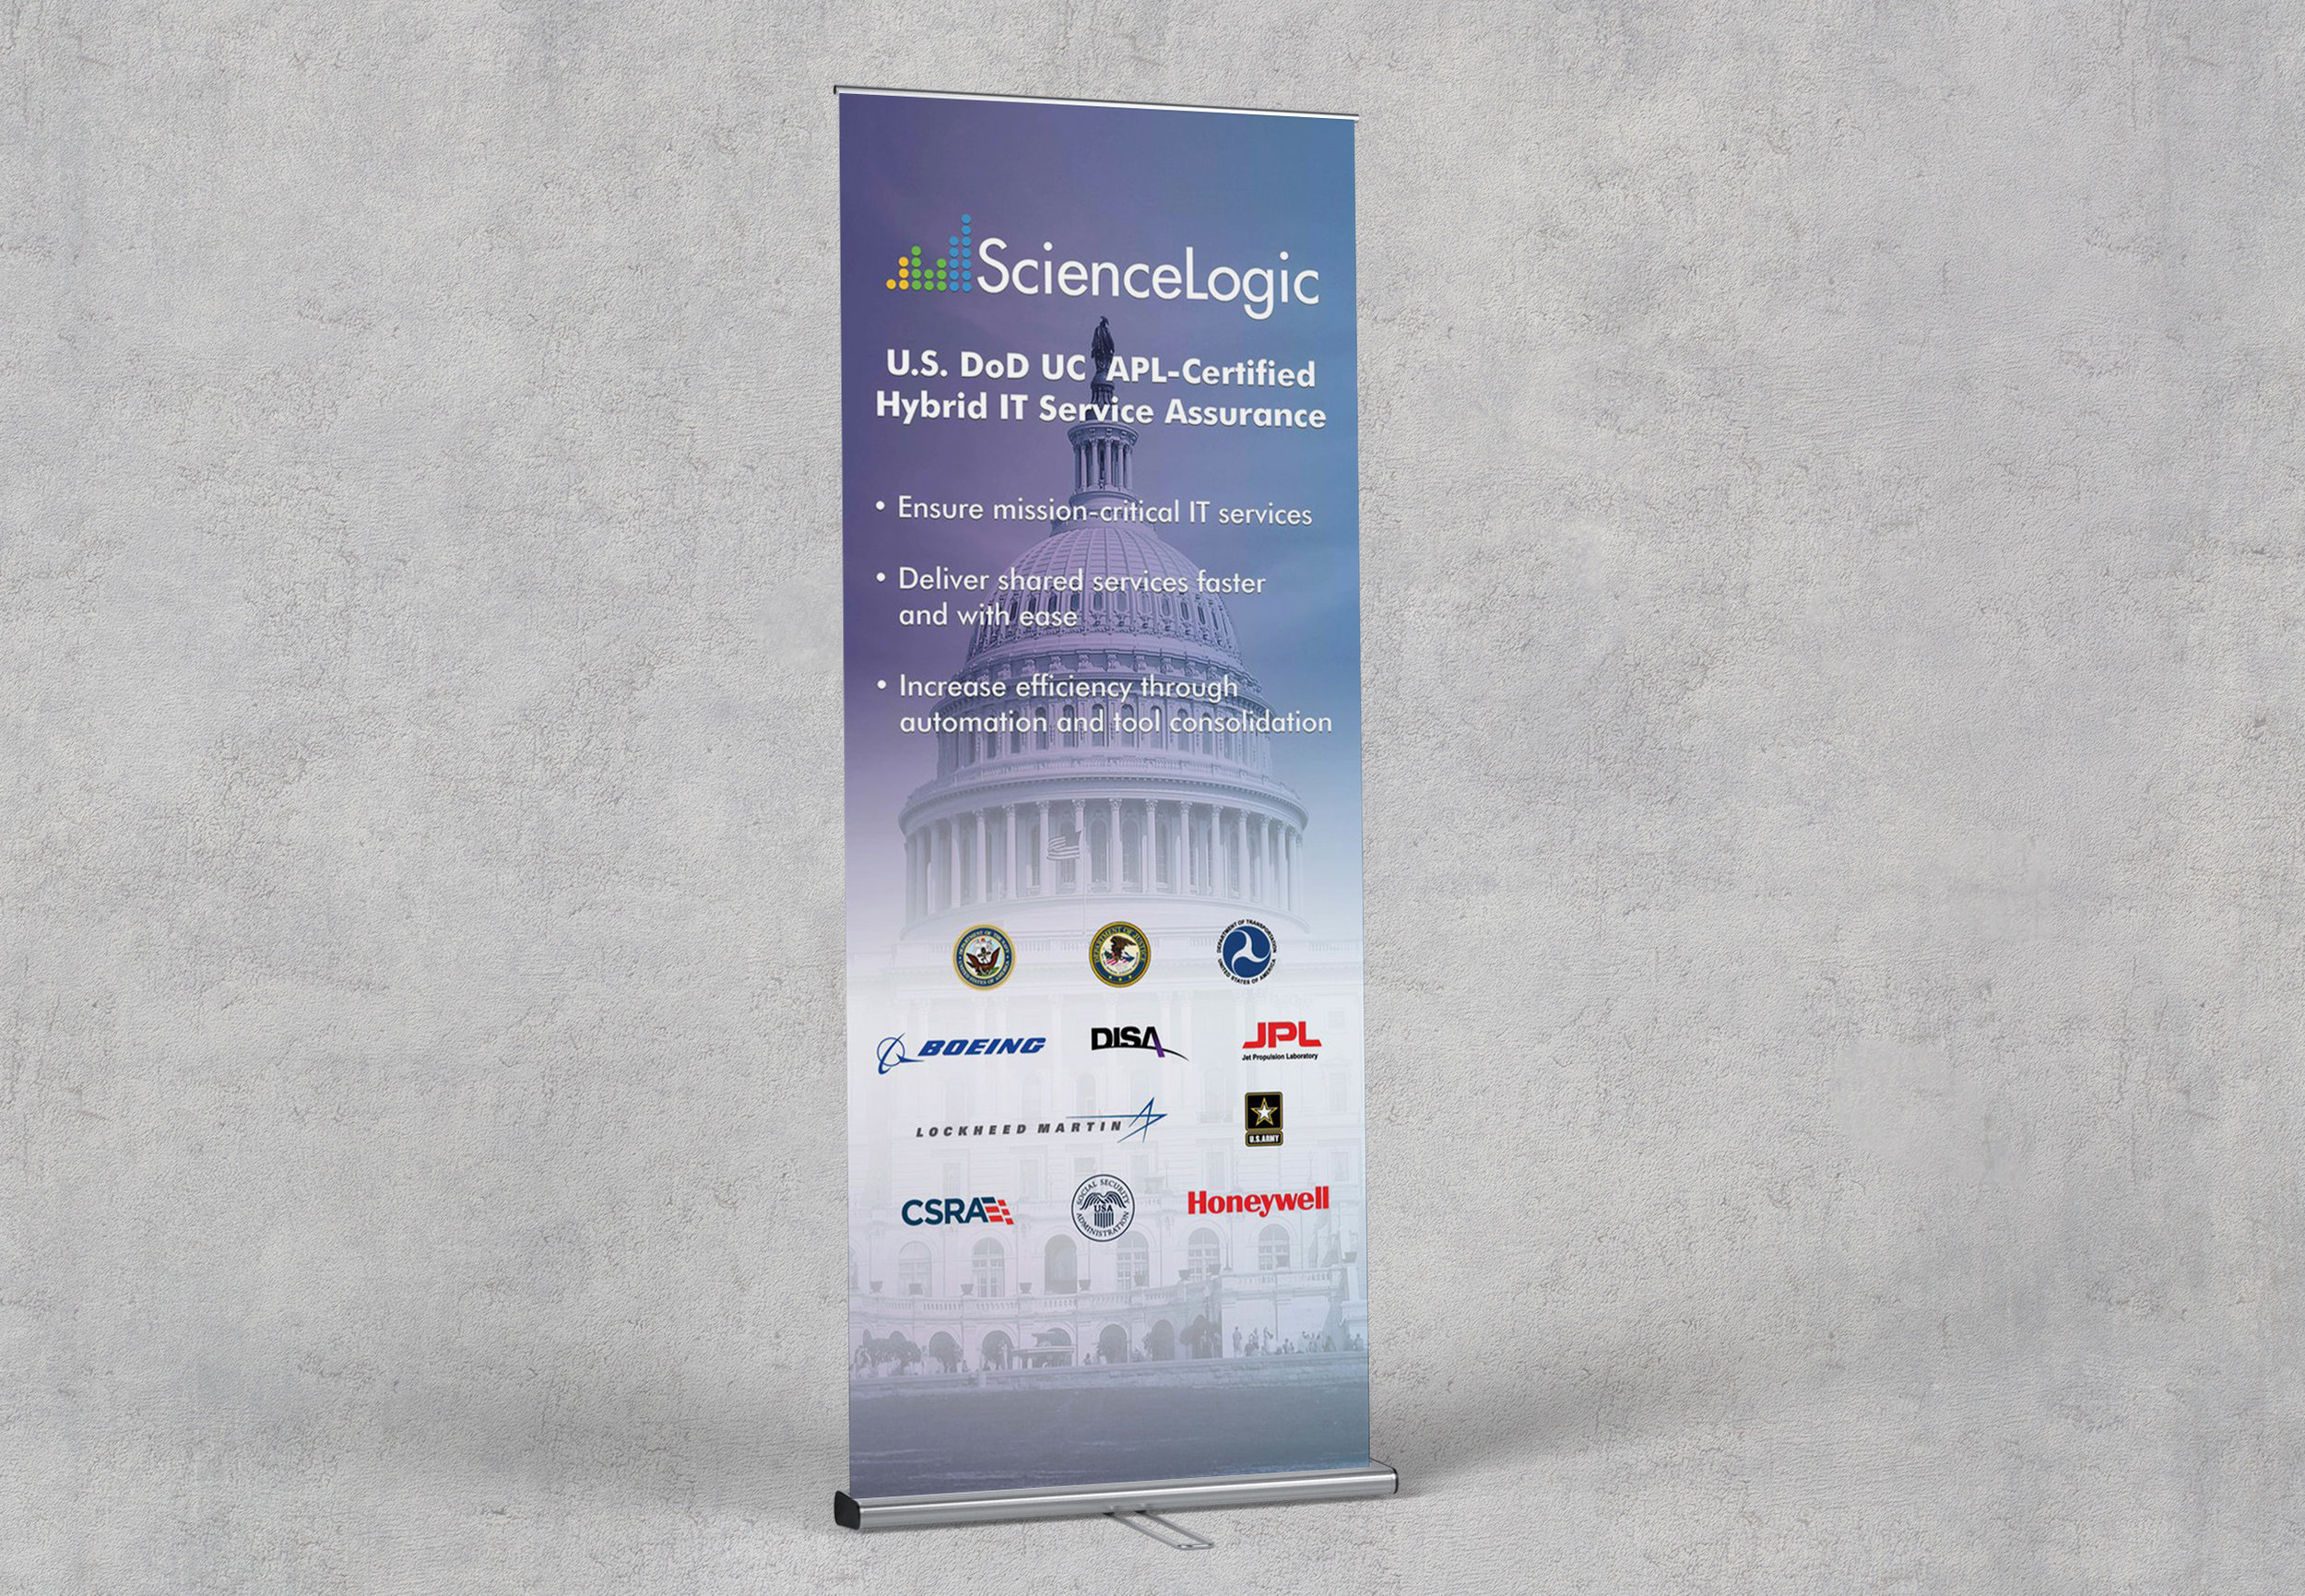 ScienceLogic Federal Display Banner